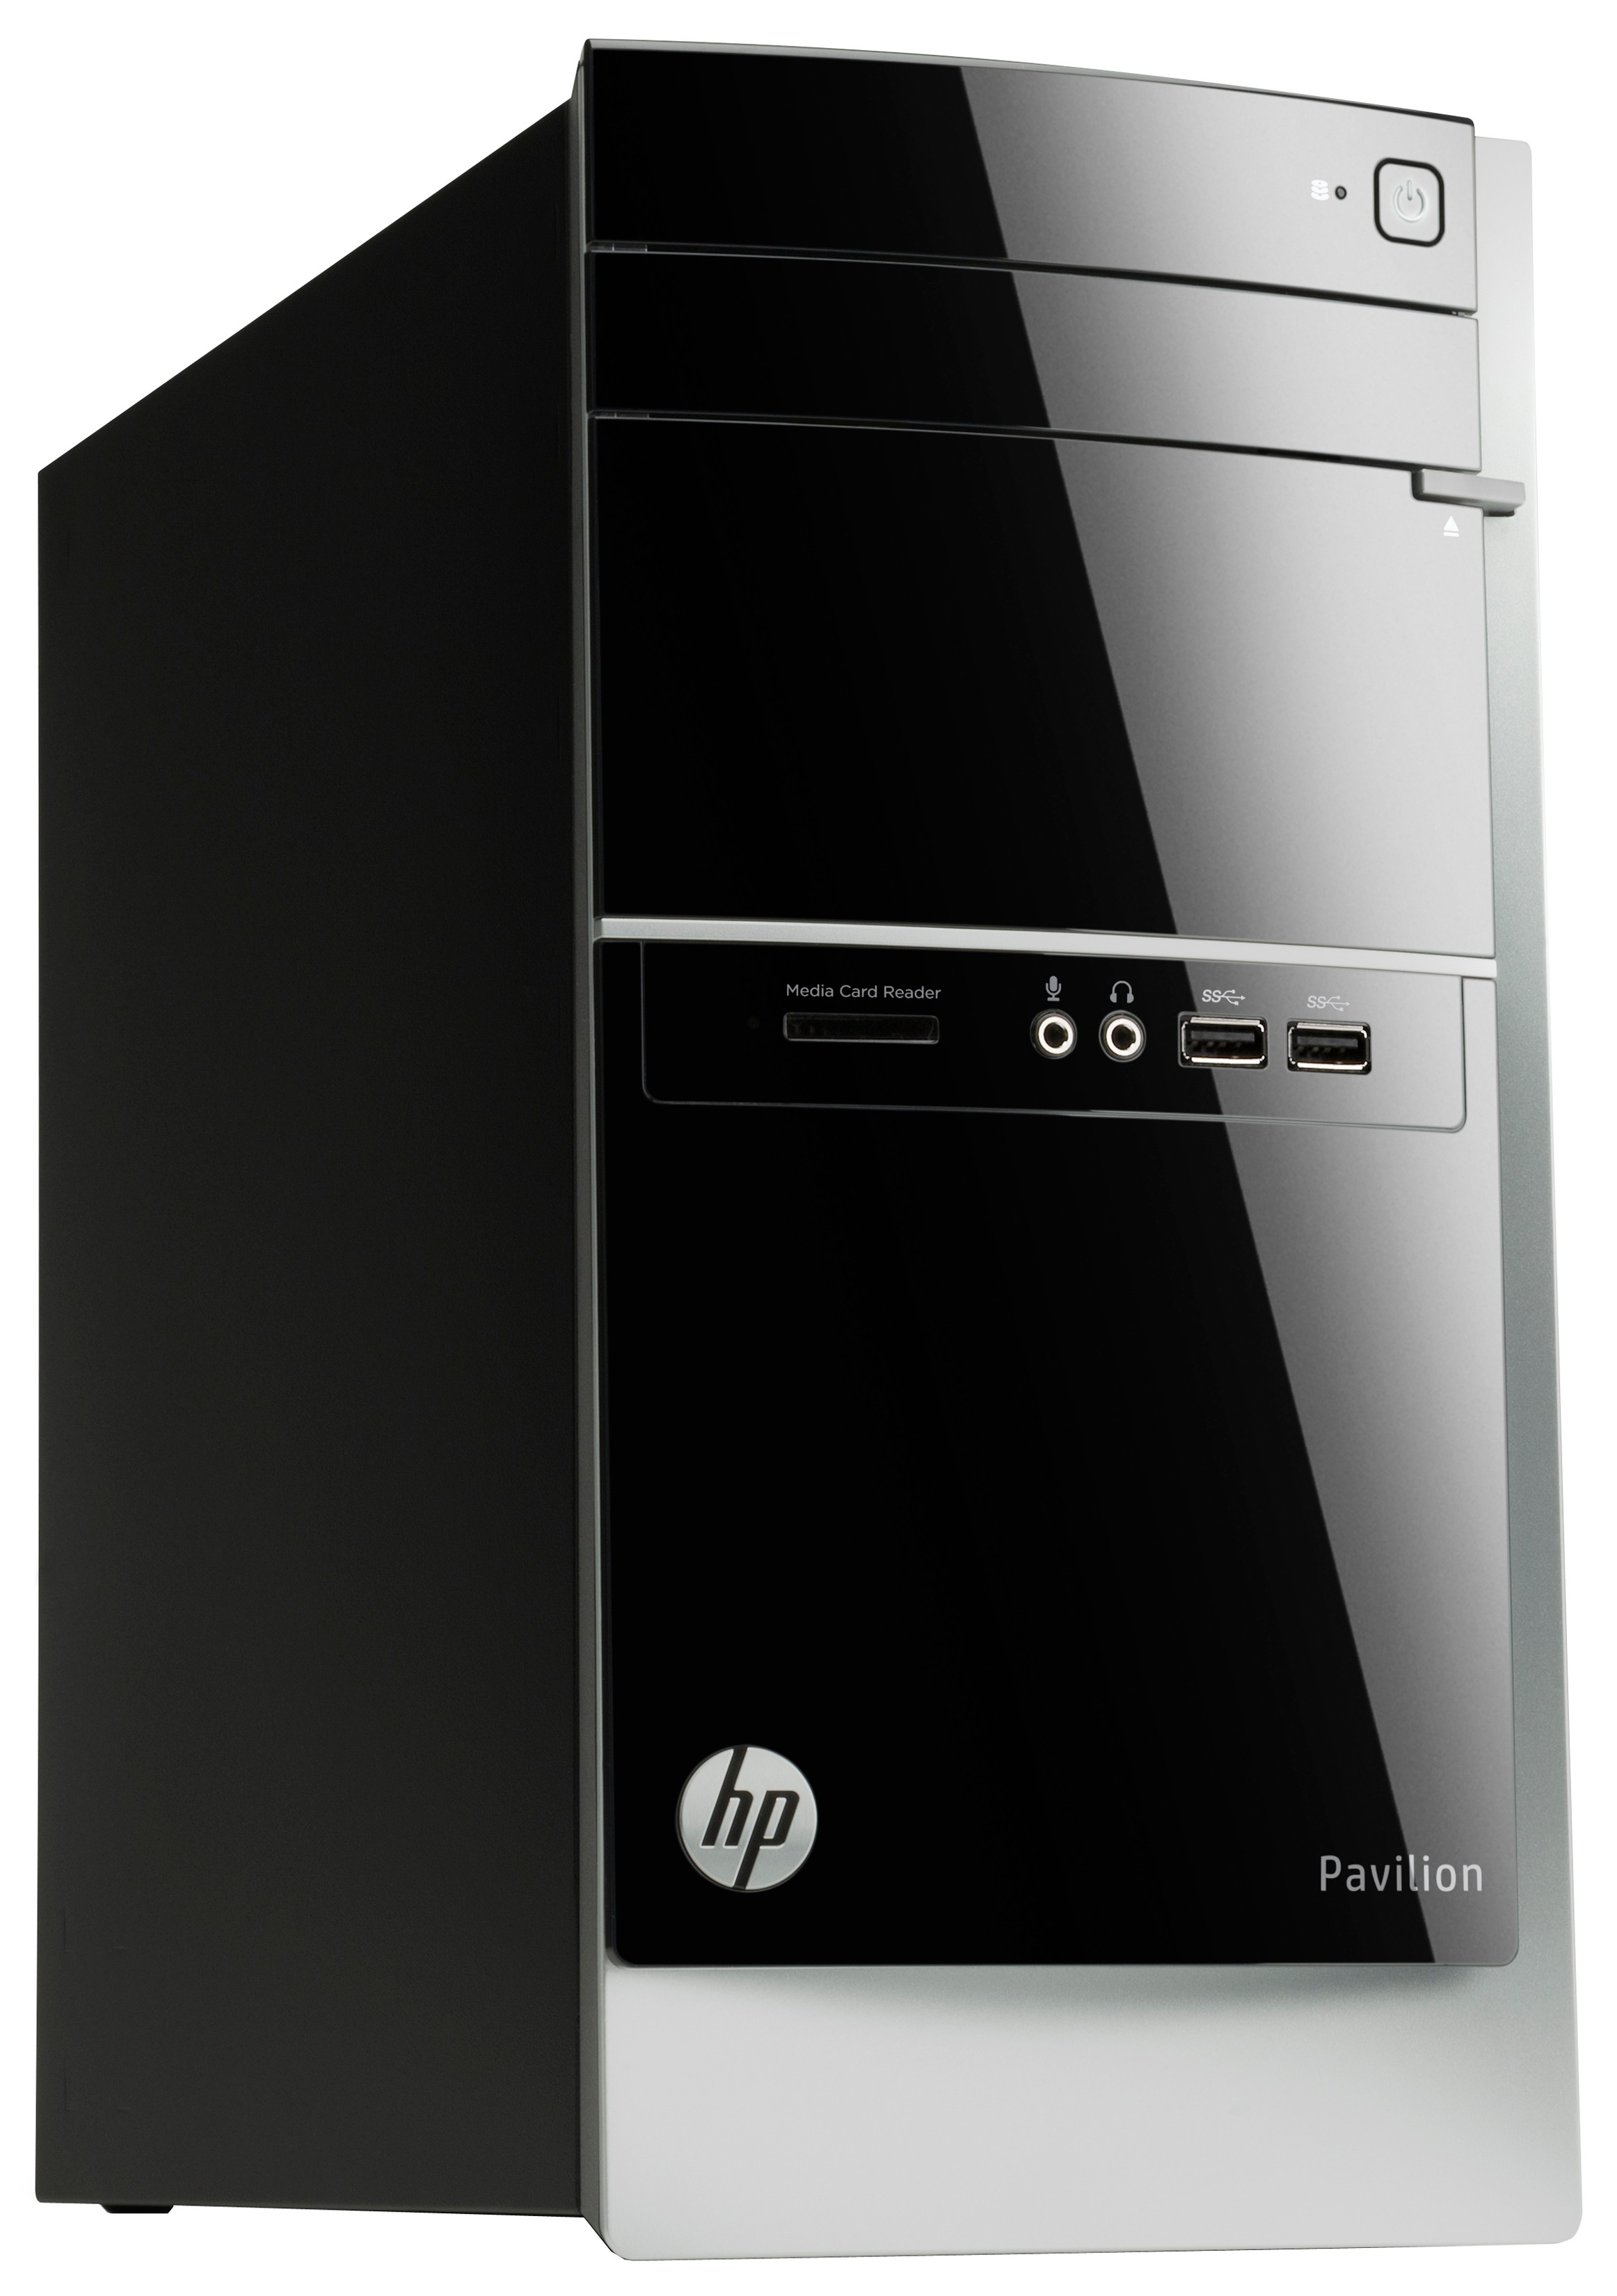 J2H80EA#UUW : HP Pavilion 500-313no stasjonær PC